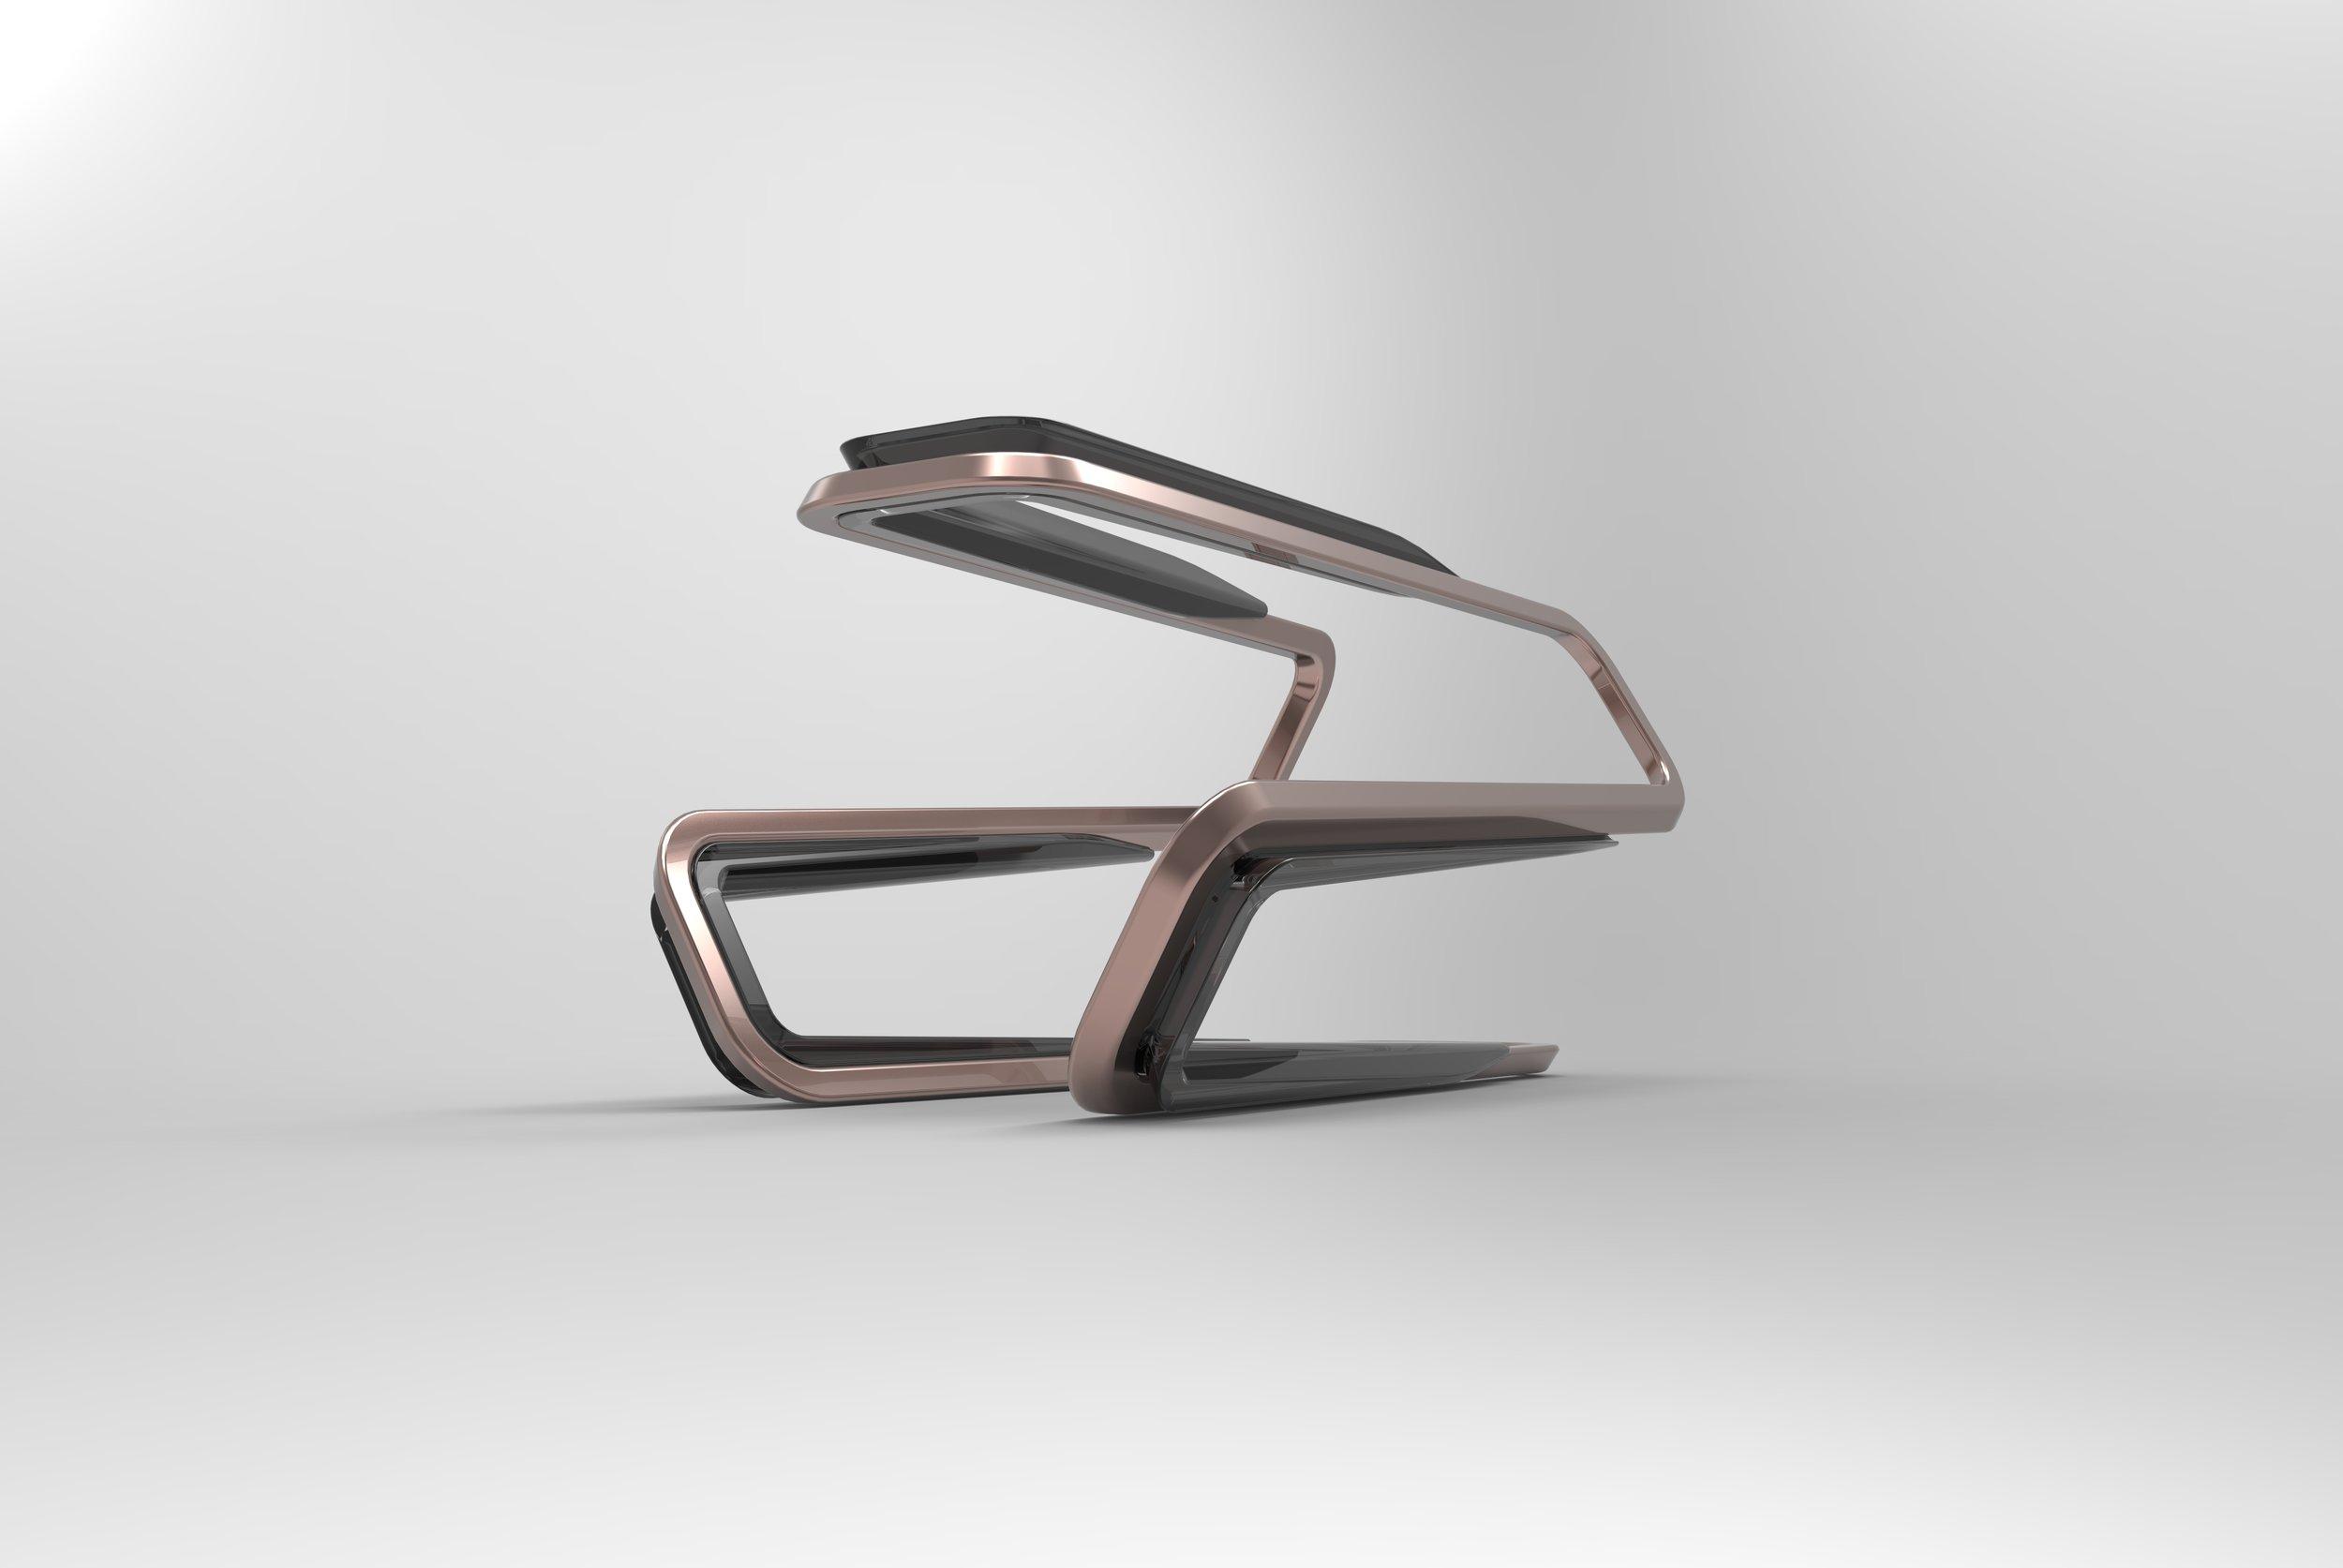 concept01 copper black.61.jpg